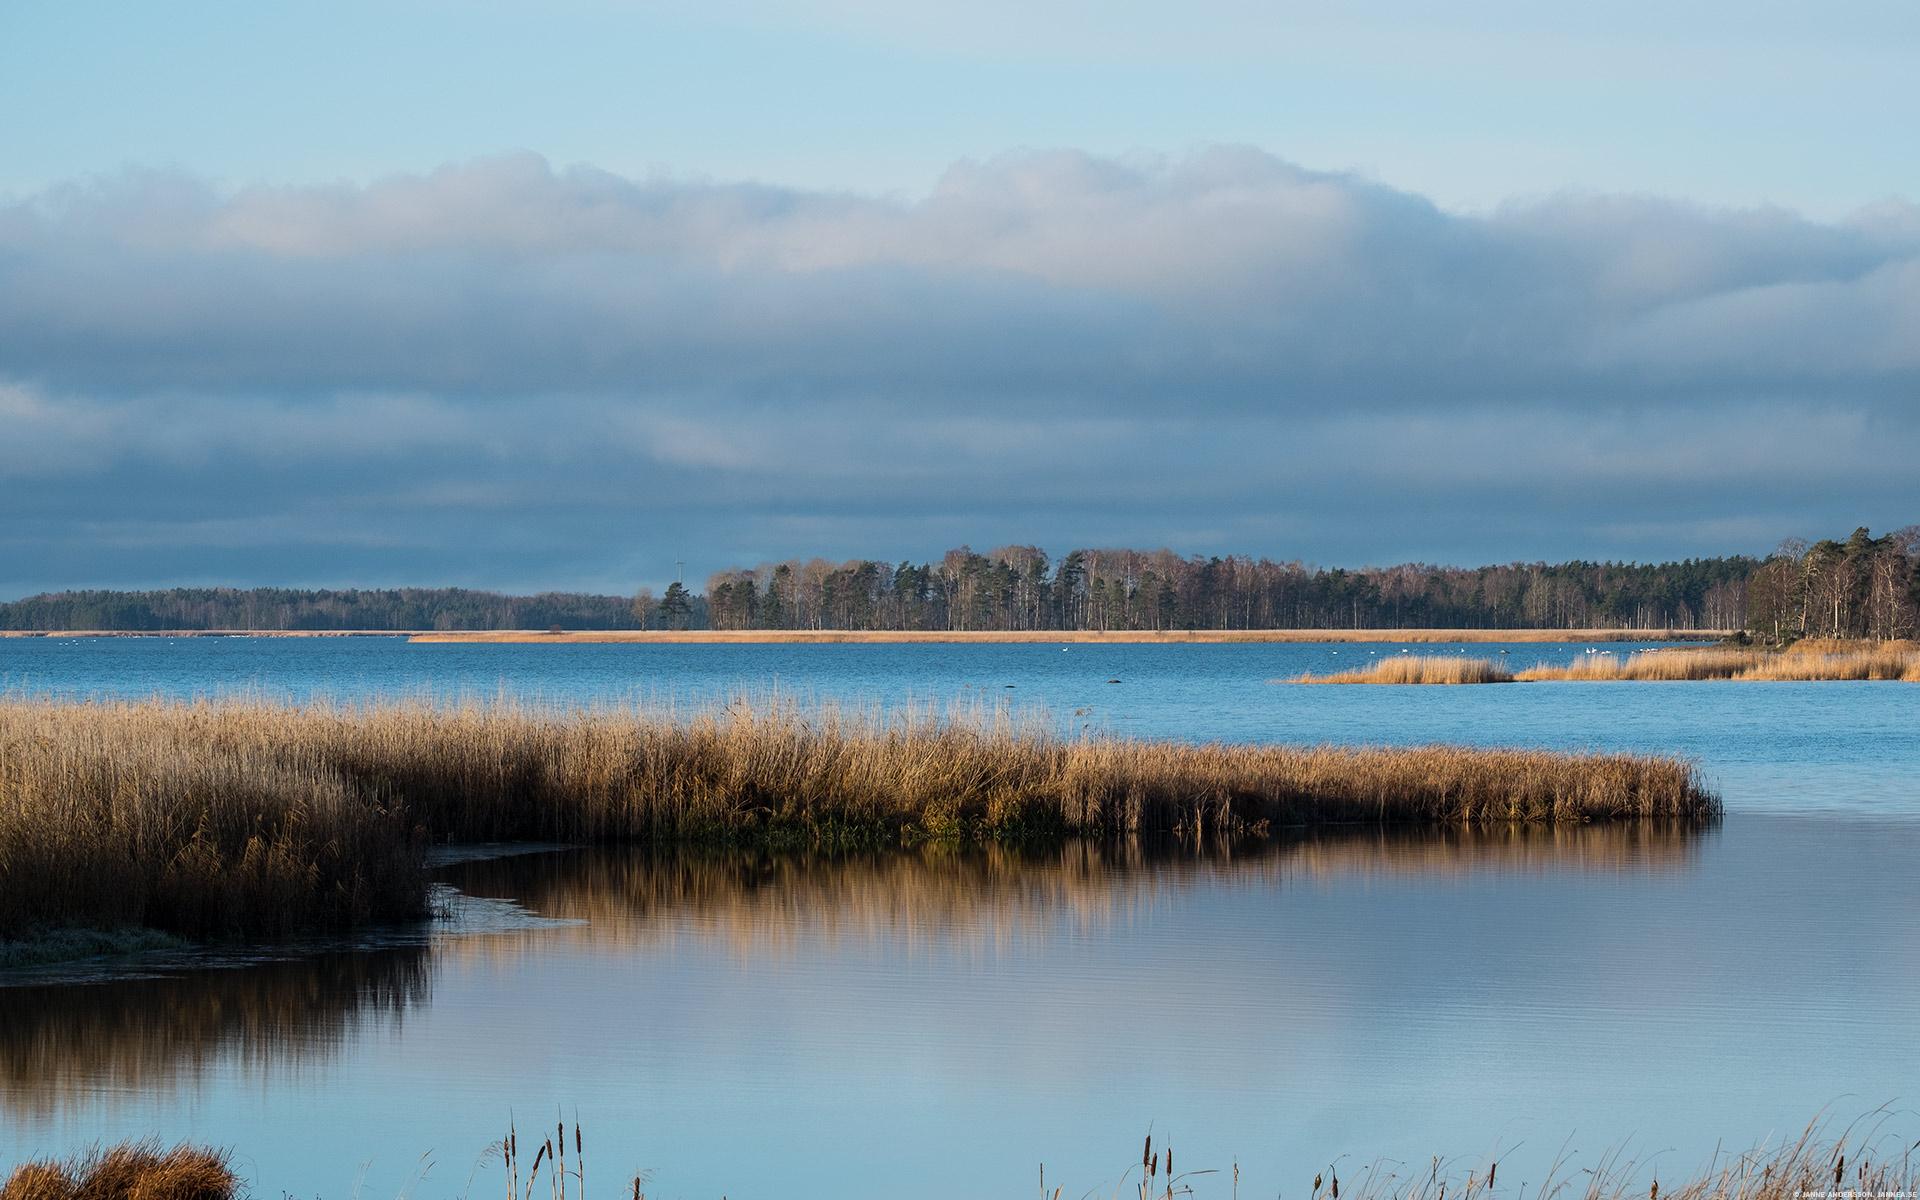 Lördagens sjö –Tåkern | ©Janne A